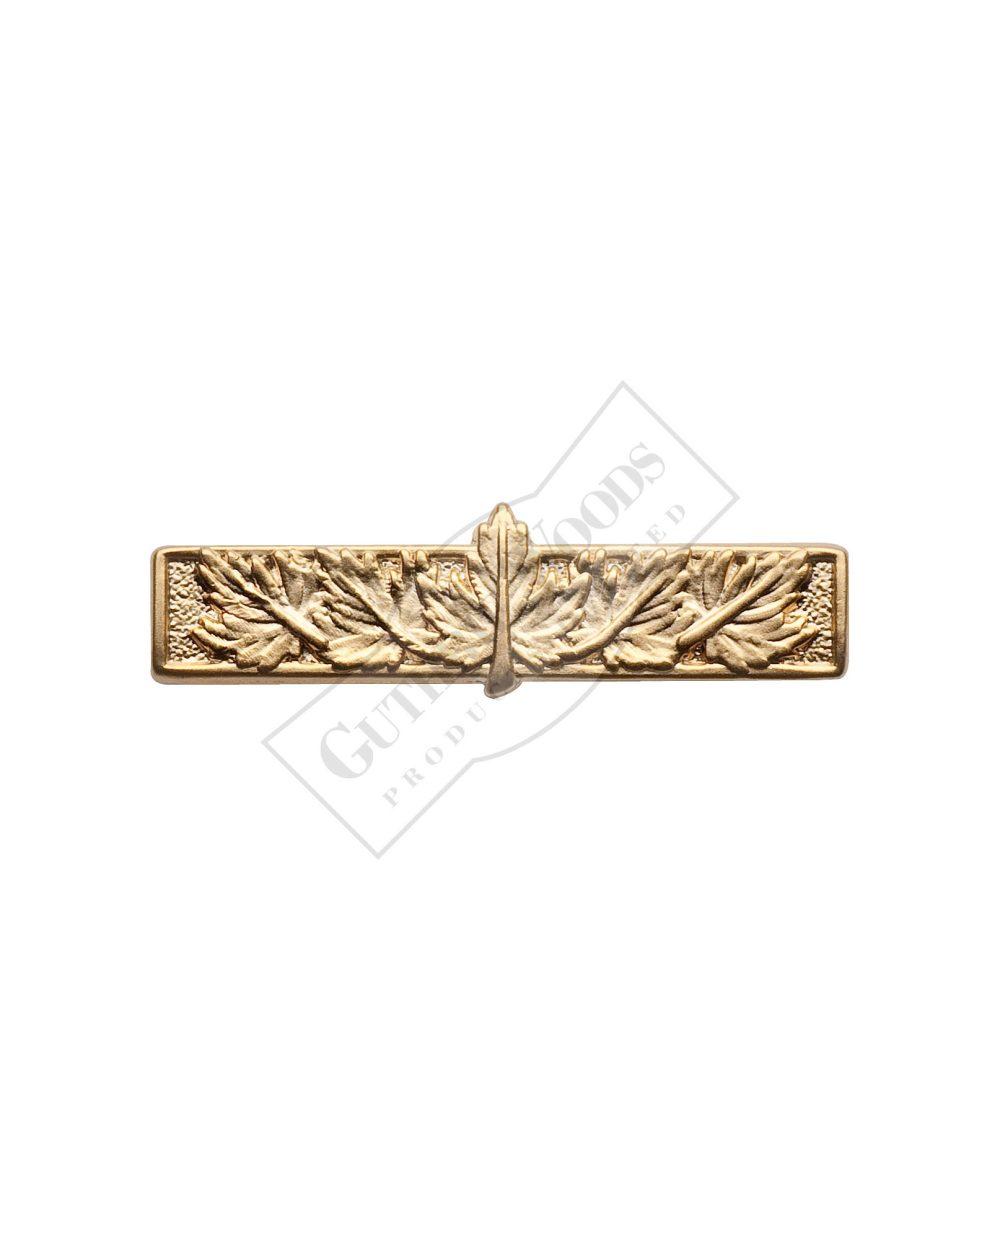 Rotation Bar, 5-Leaf, Gold #246-G